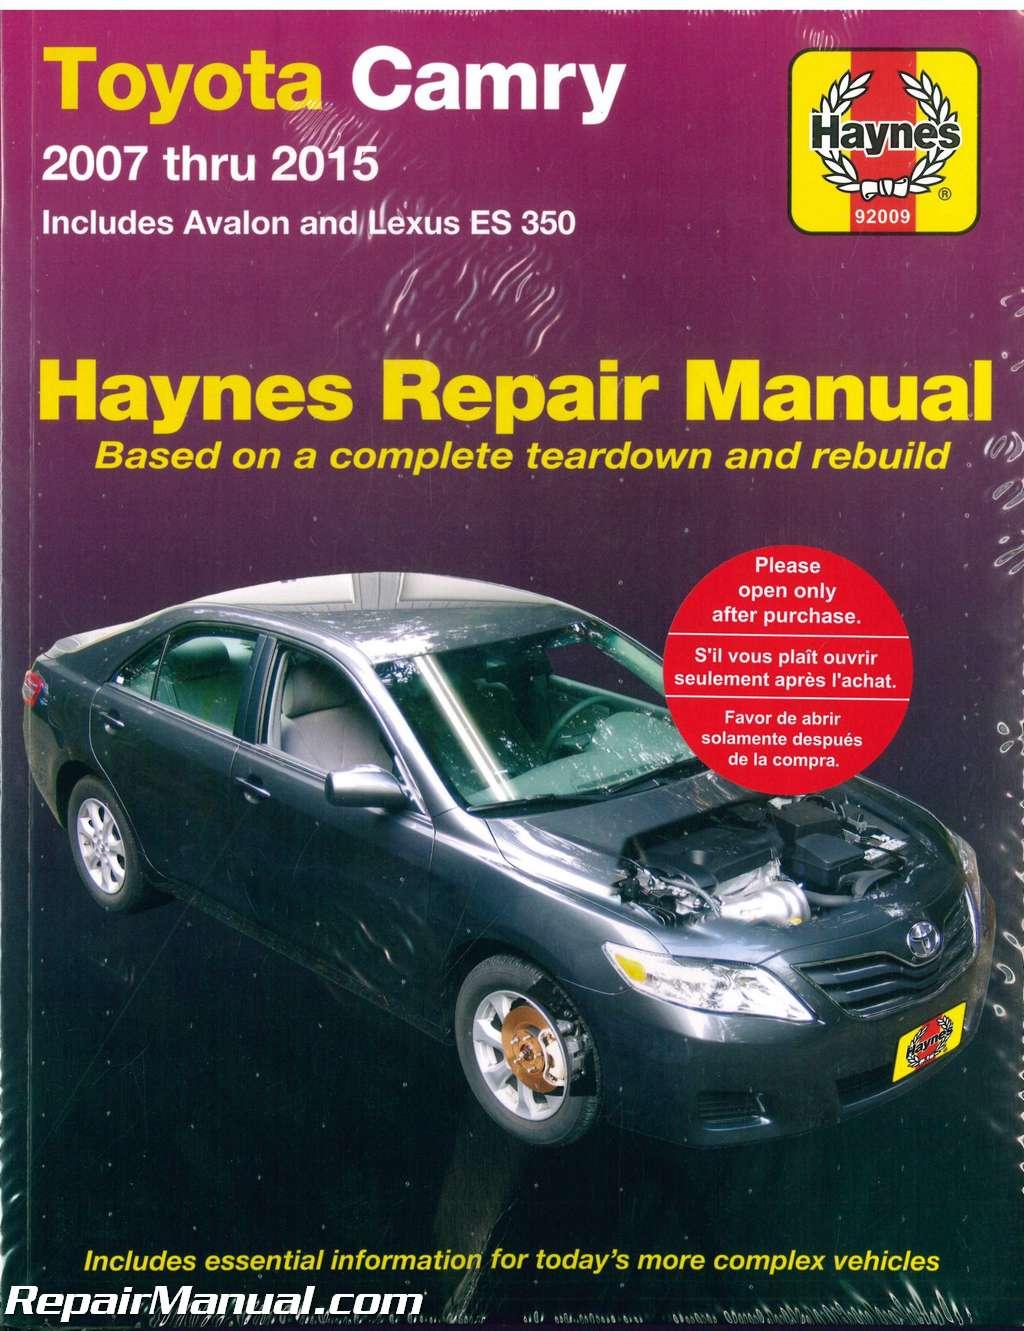 Haynes Toyota Camry Avalon Lexus Es 350 2007